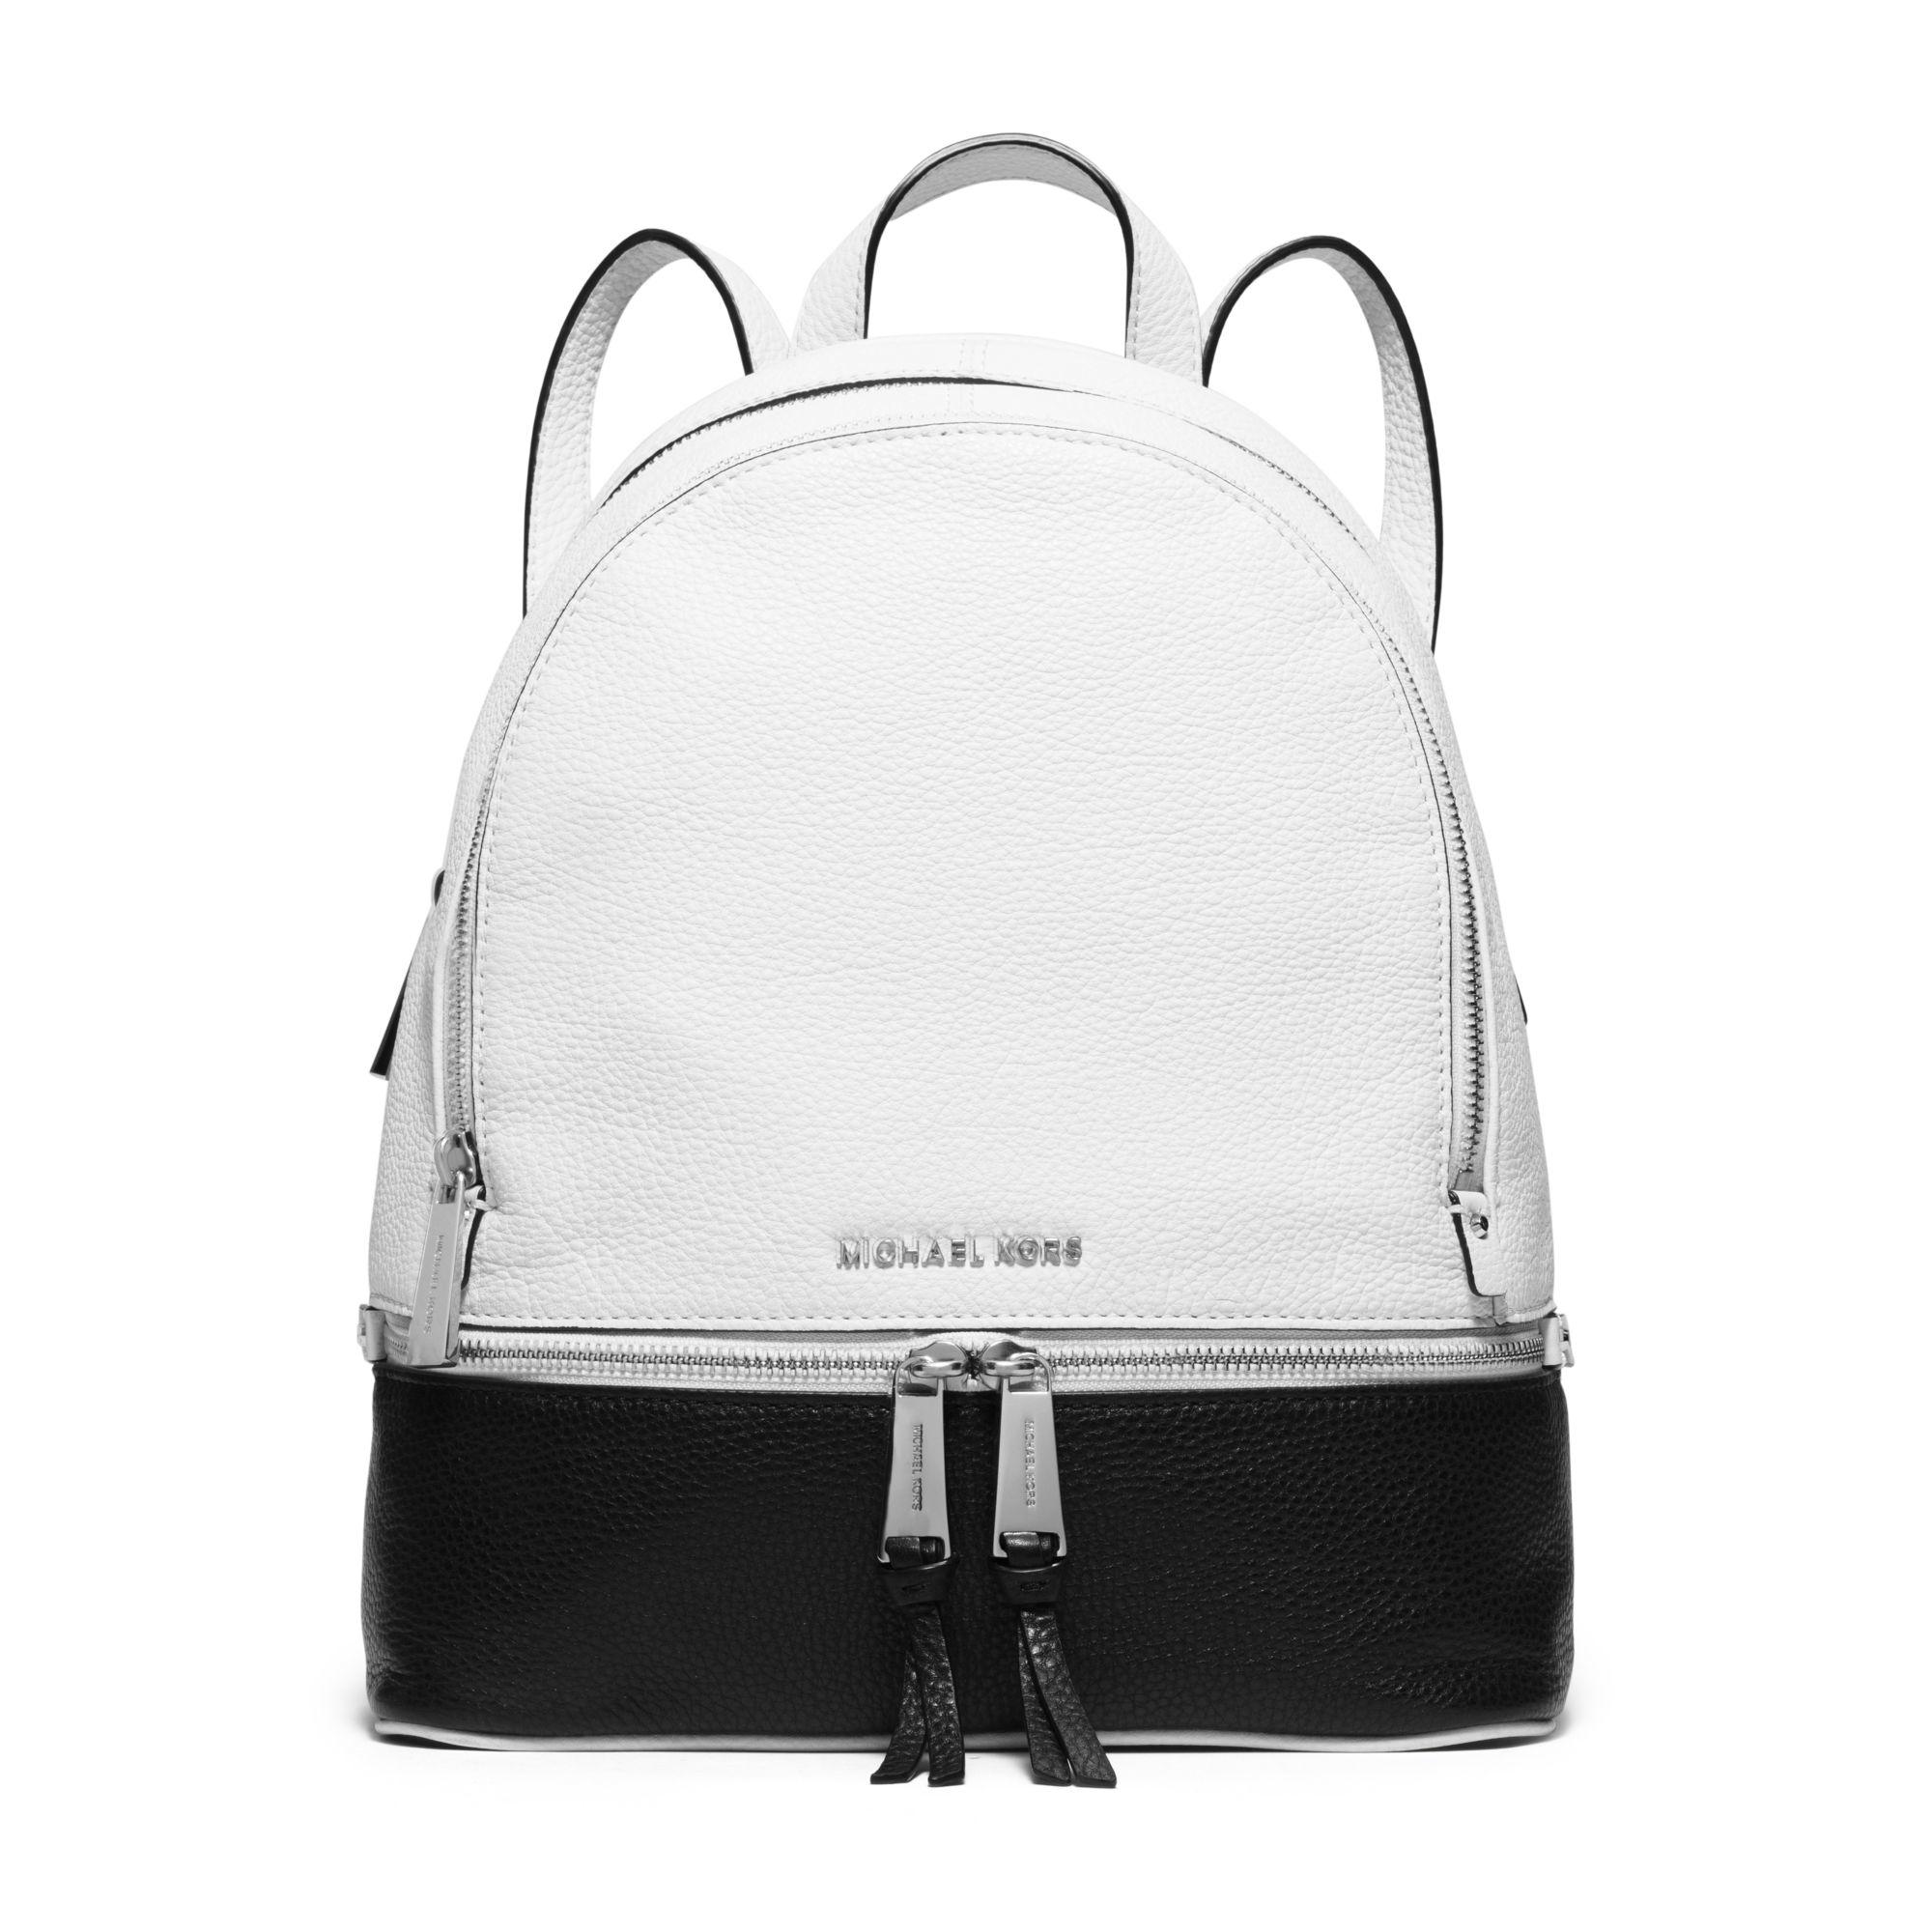 21acb9037f4a Michael Kors Rhea Medium Color-block Leather Backpack in Black - Lyst